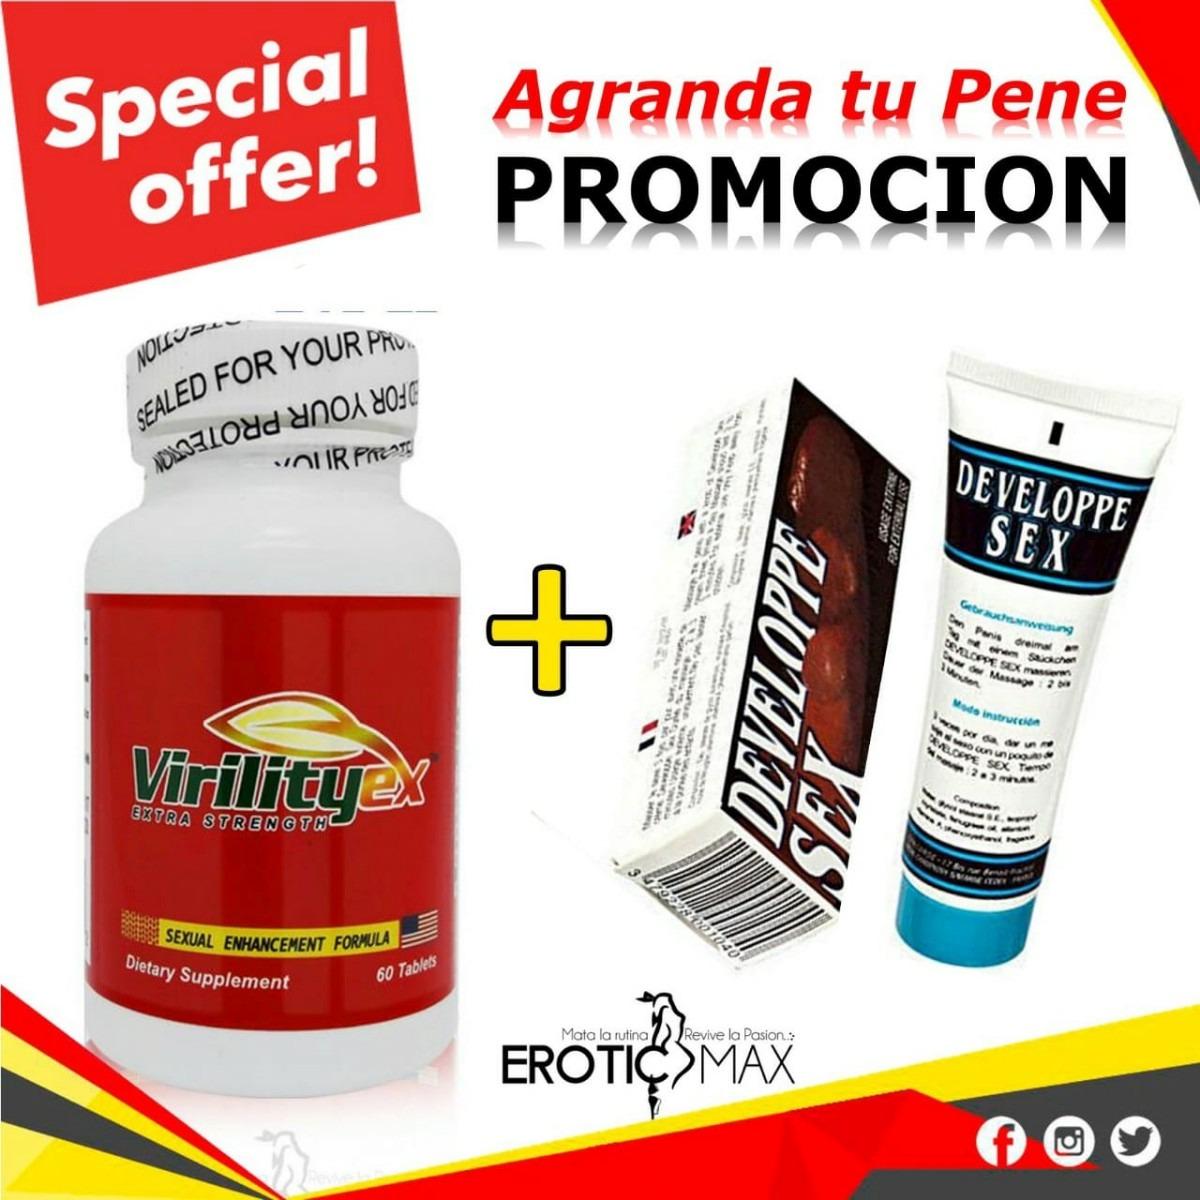 Virility Ex Original Gratis Crema Crecimiento Del Pene U S 55 00